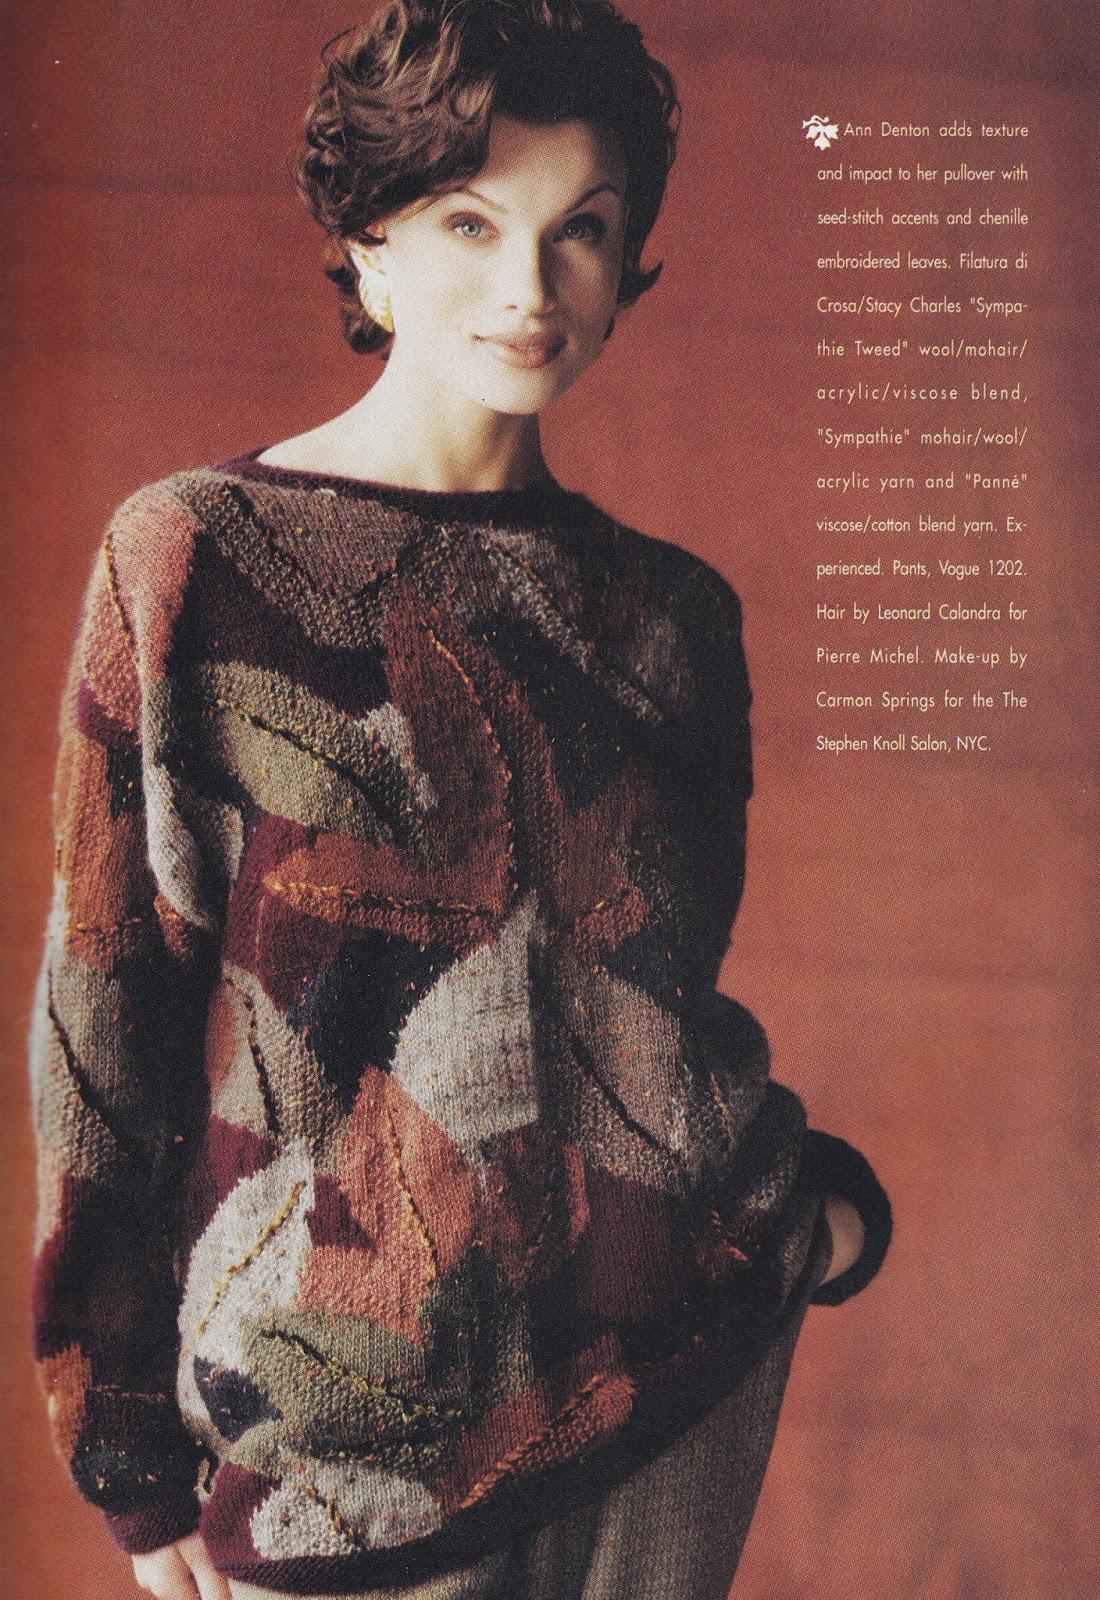 d1dd92791 December 2016 (323 views) Filed under Fashion Menswear Tailoring Machine  knitting Toksick Magazine. The Midtown Cardigan